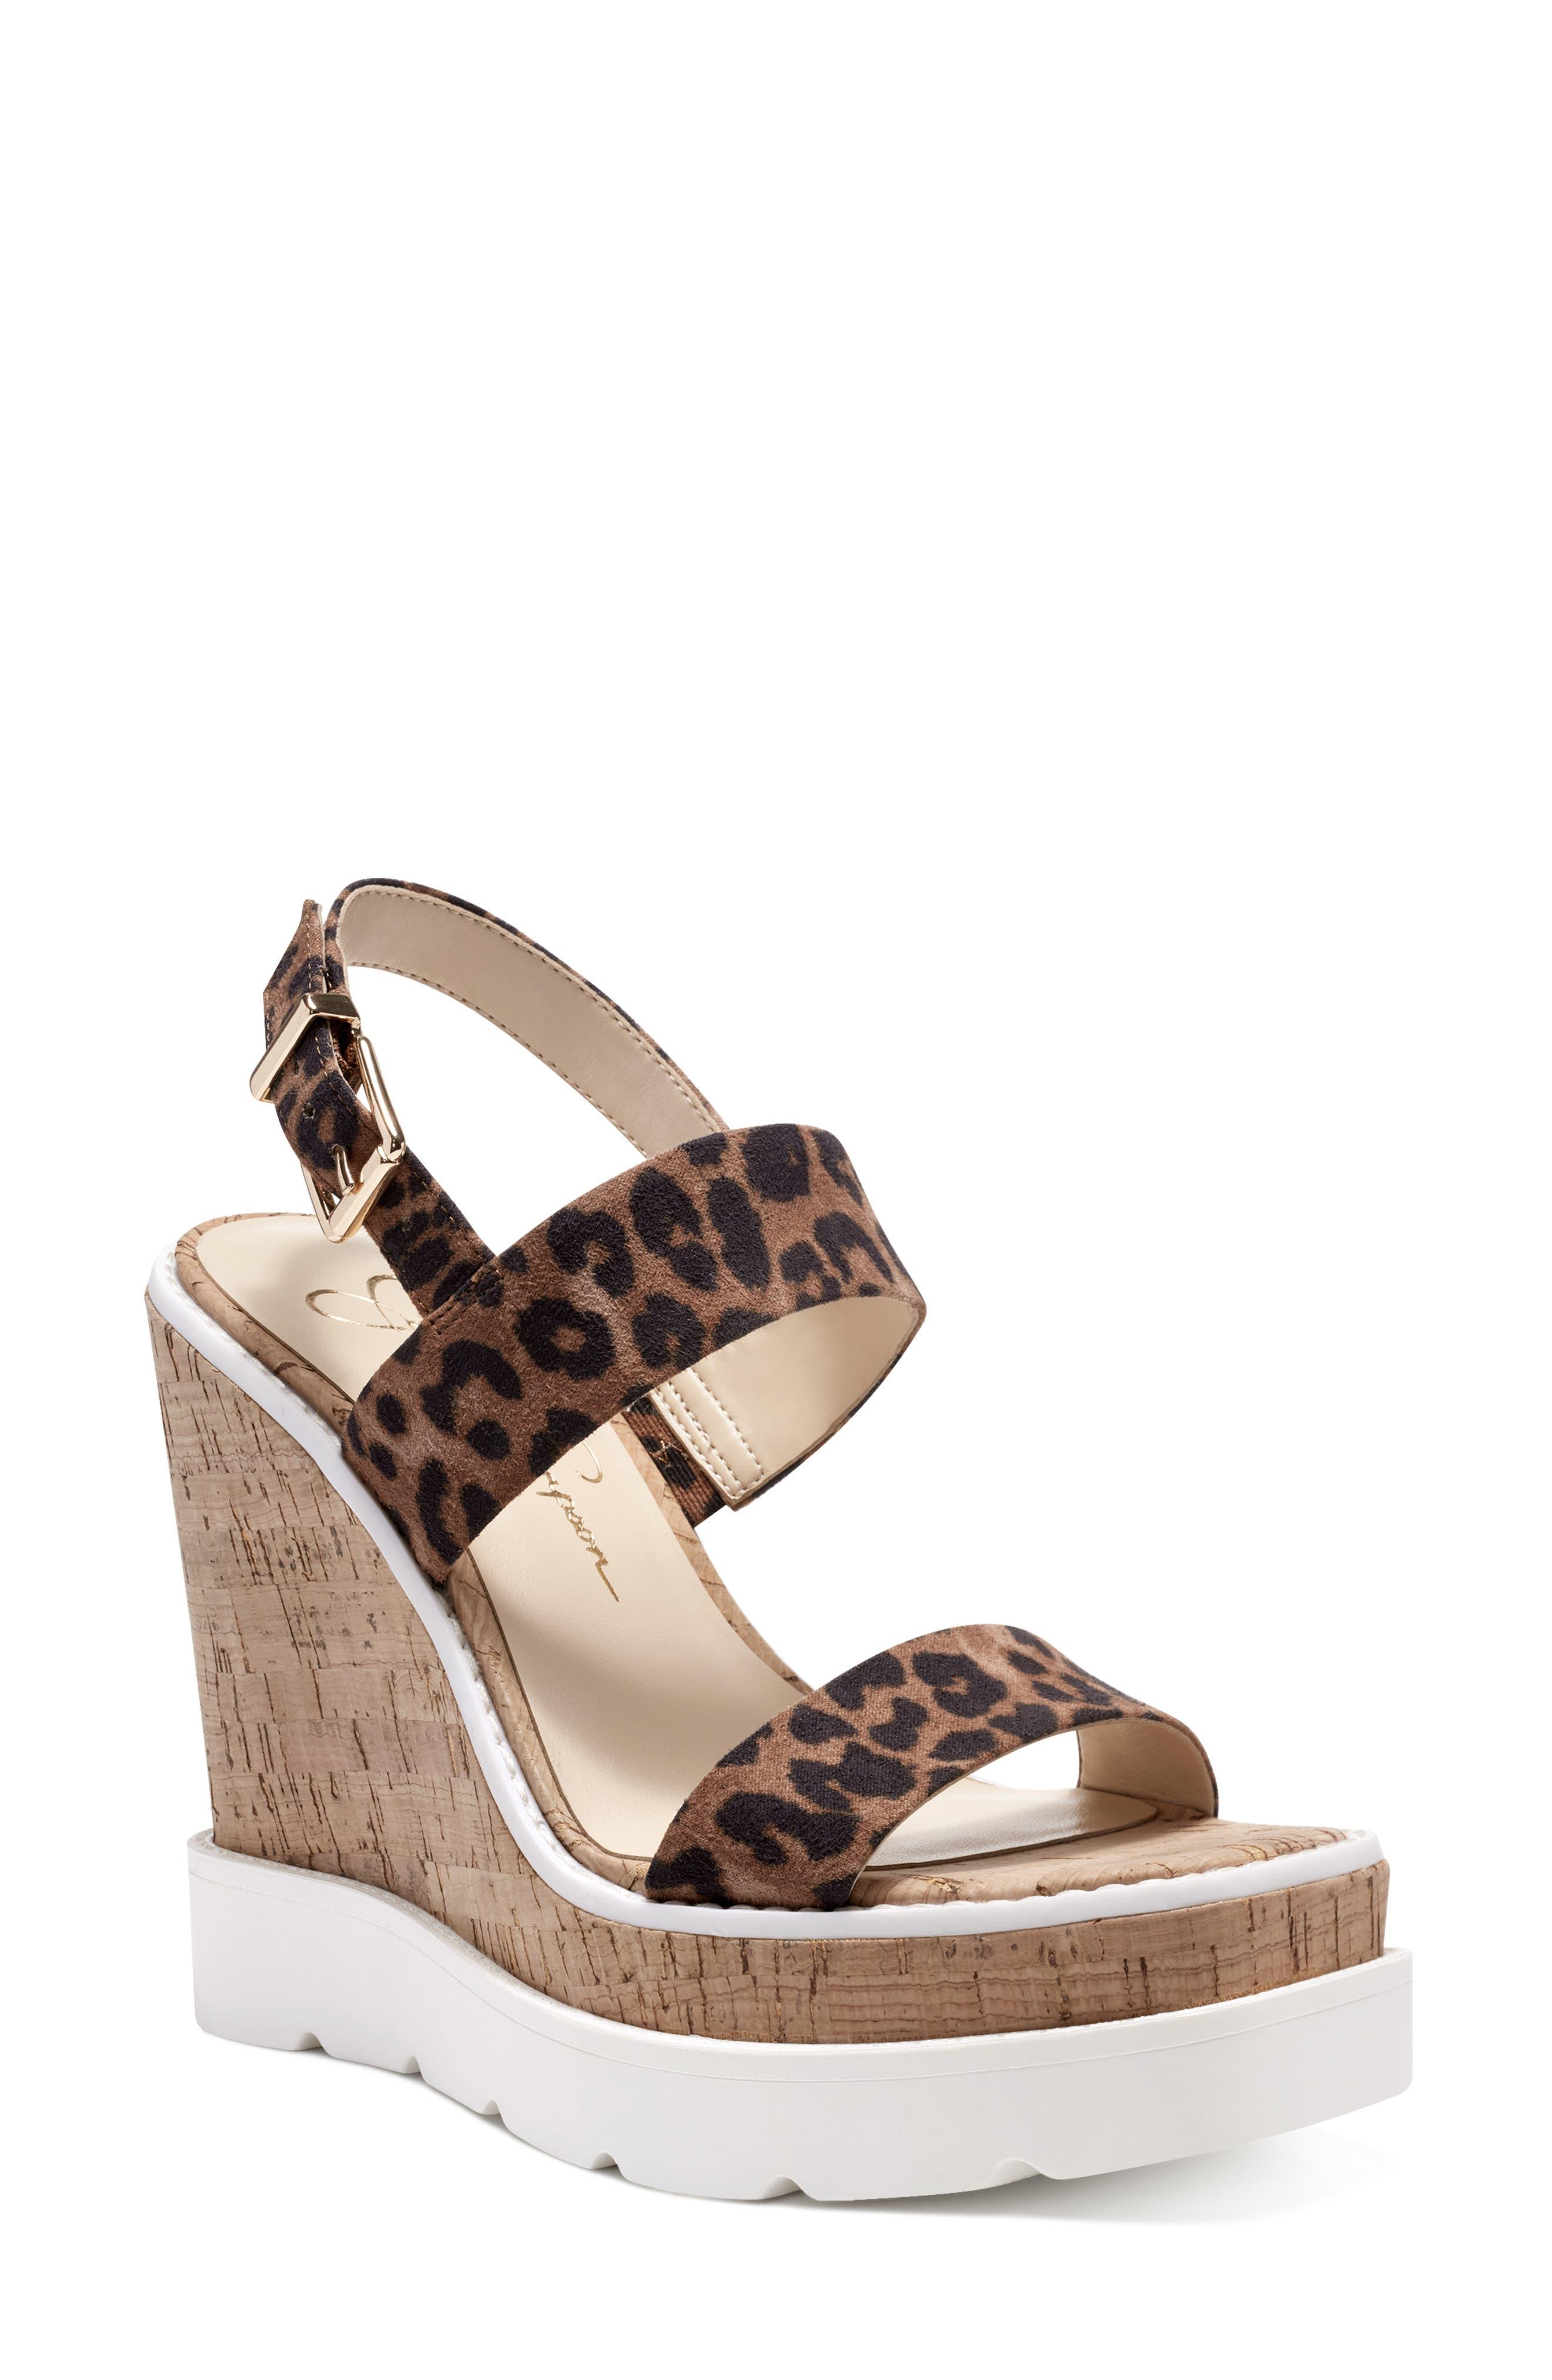 Maede Cork Wedge Sandal